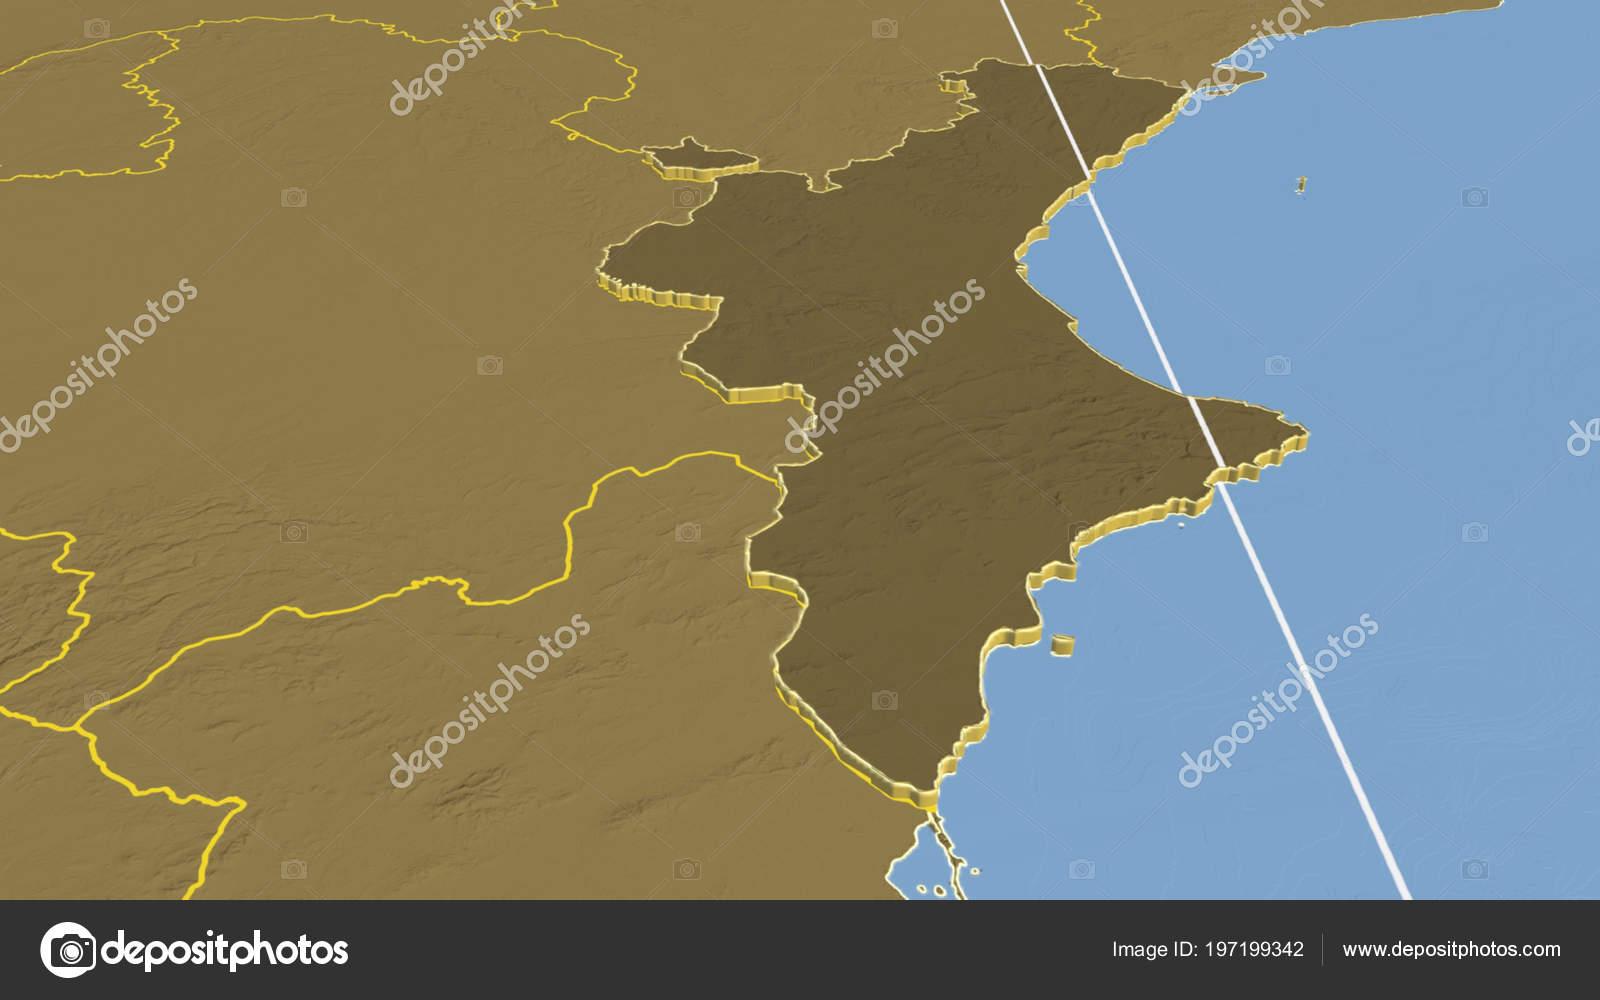 Elevation Map Of Spain.Comunidad Valenciana Region Spain Extruded Bilevel Elevation Map